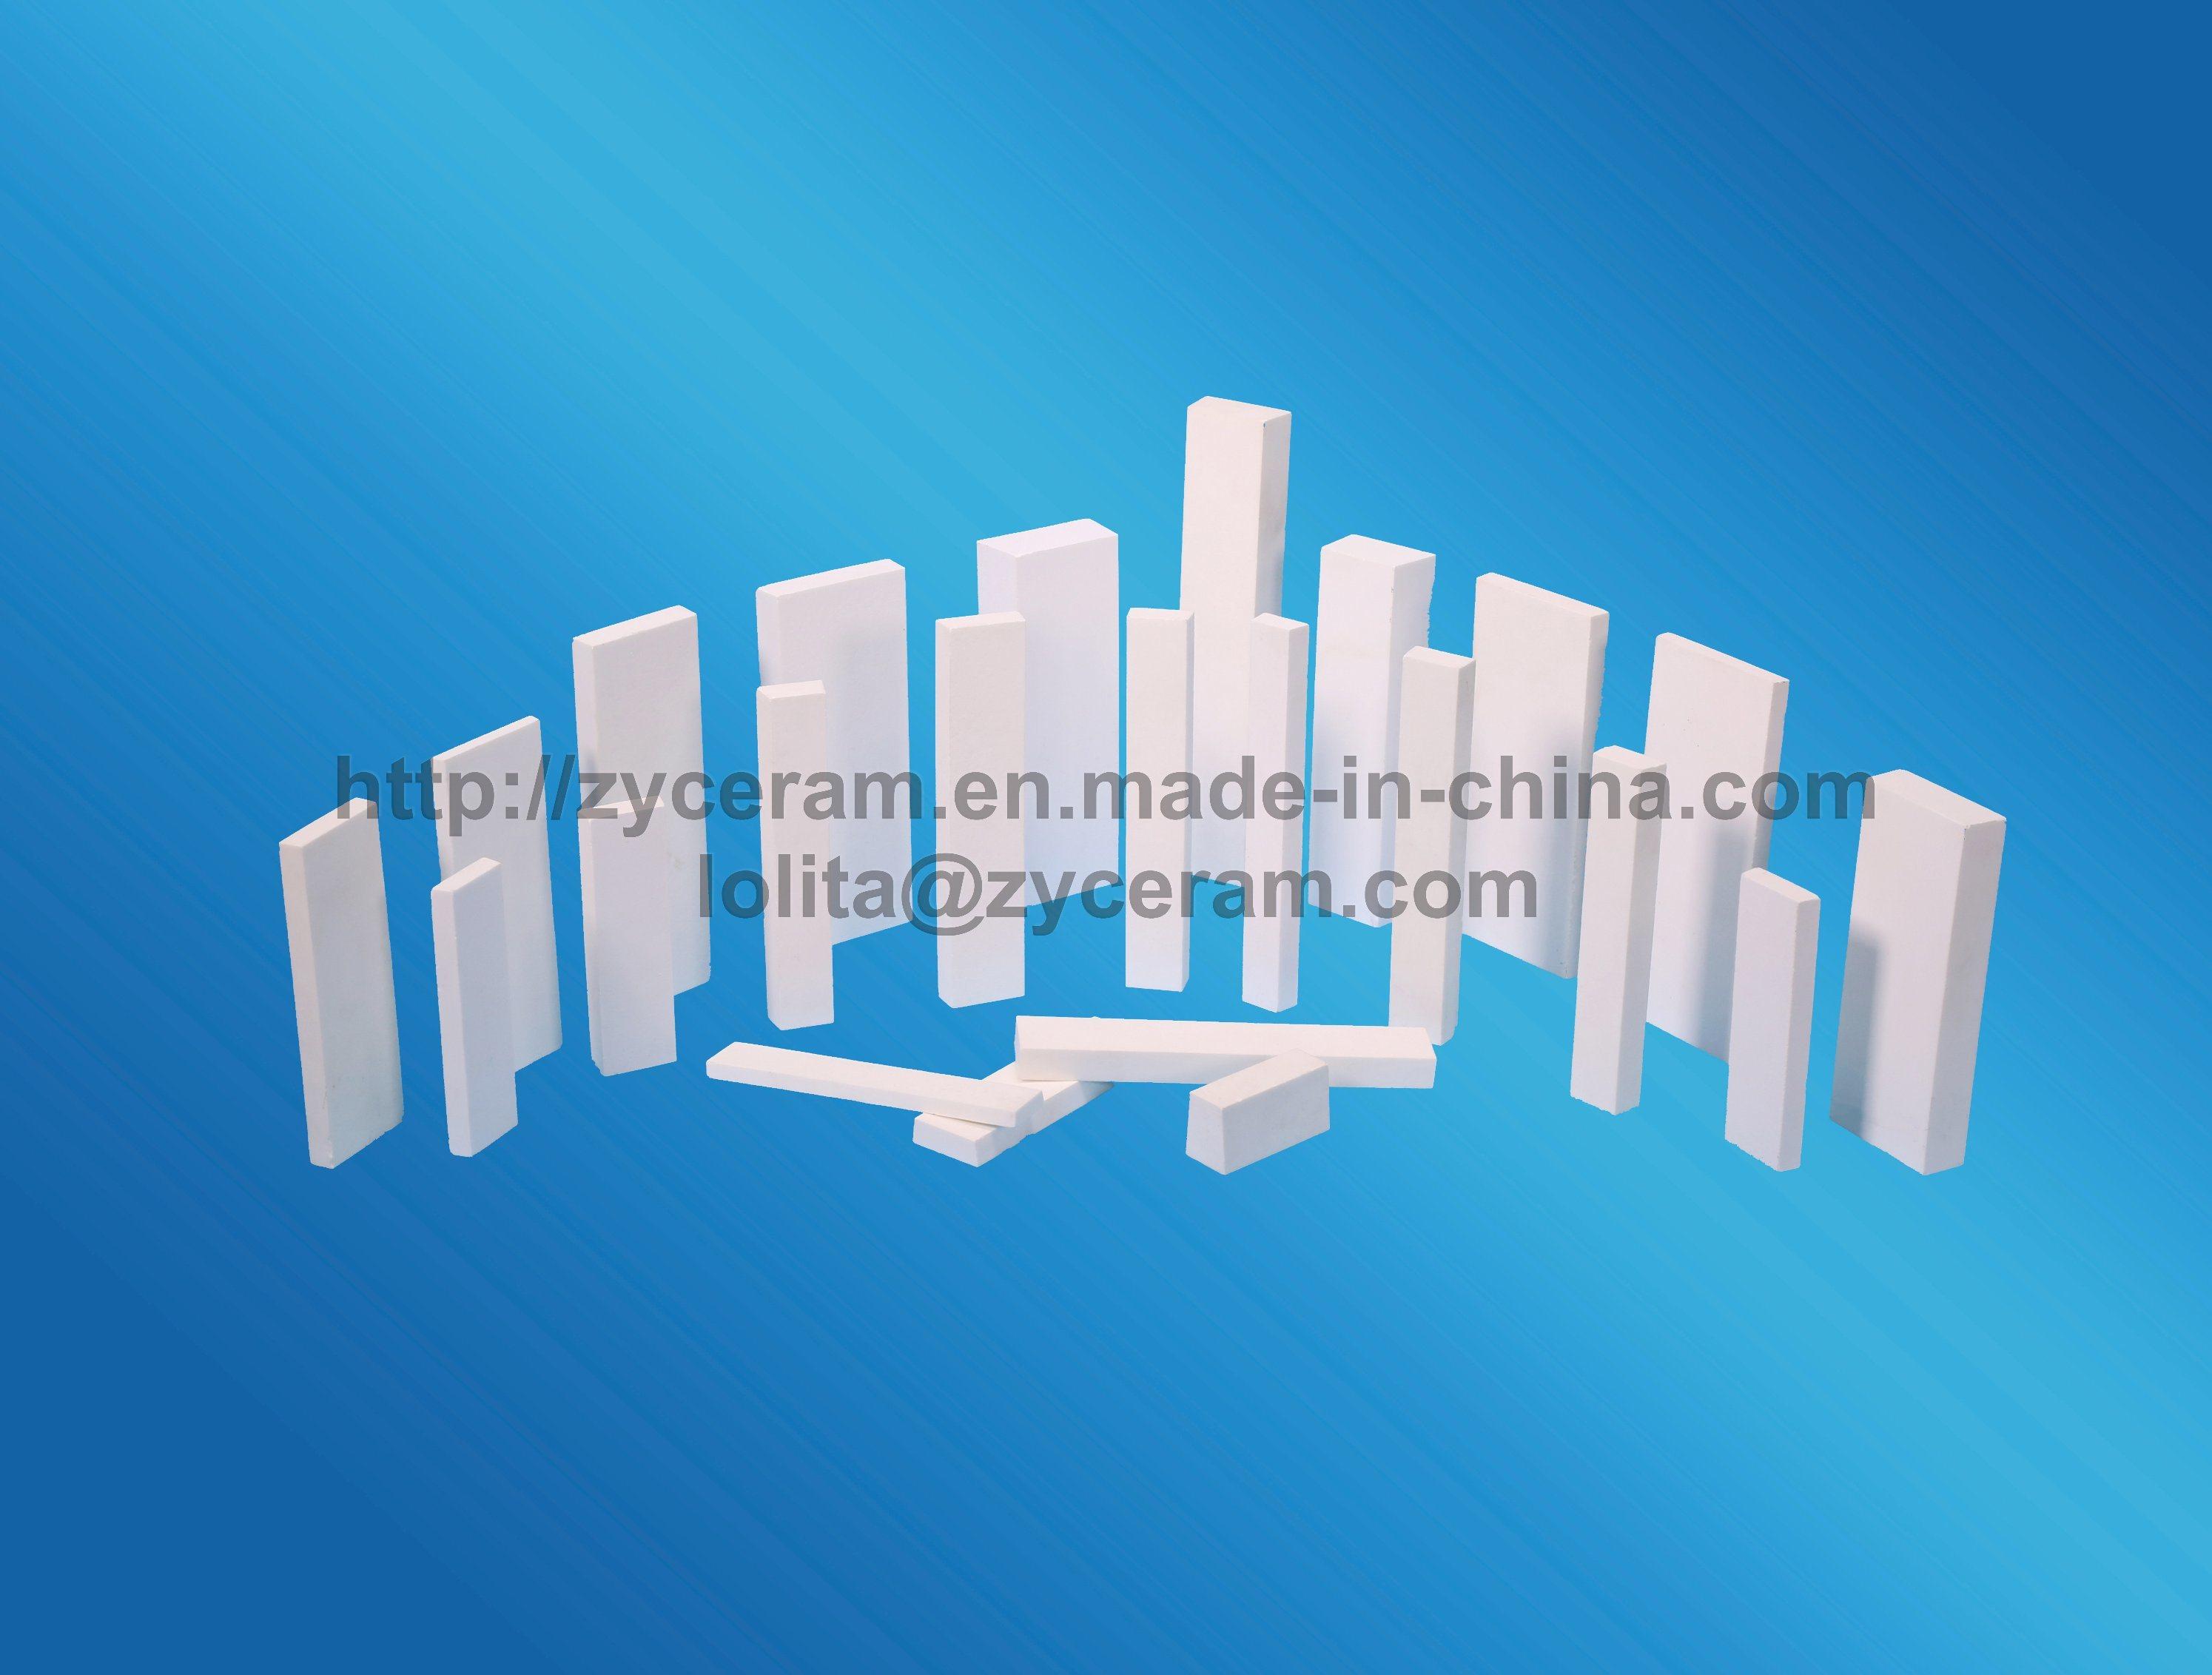 China Alkali-Resistance Alumina Ceramic Lined Slurry